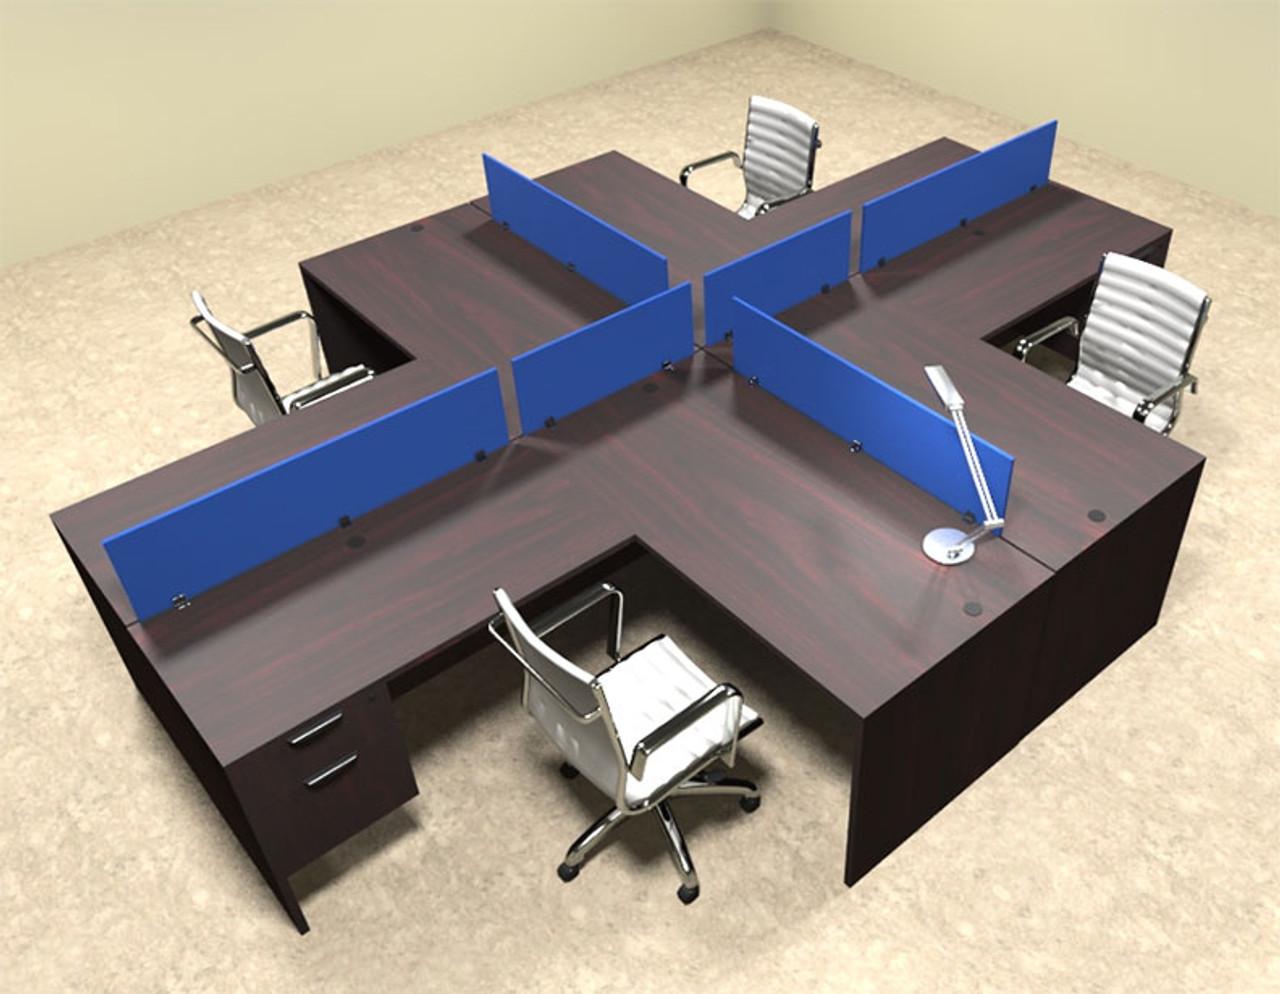 Four Person Blue Divider Office Workstation Desk Set, #OT-SUL-FPB43